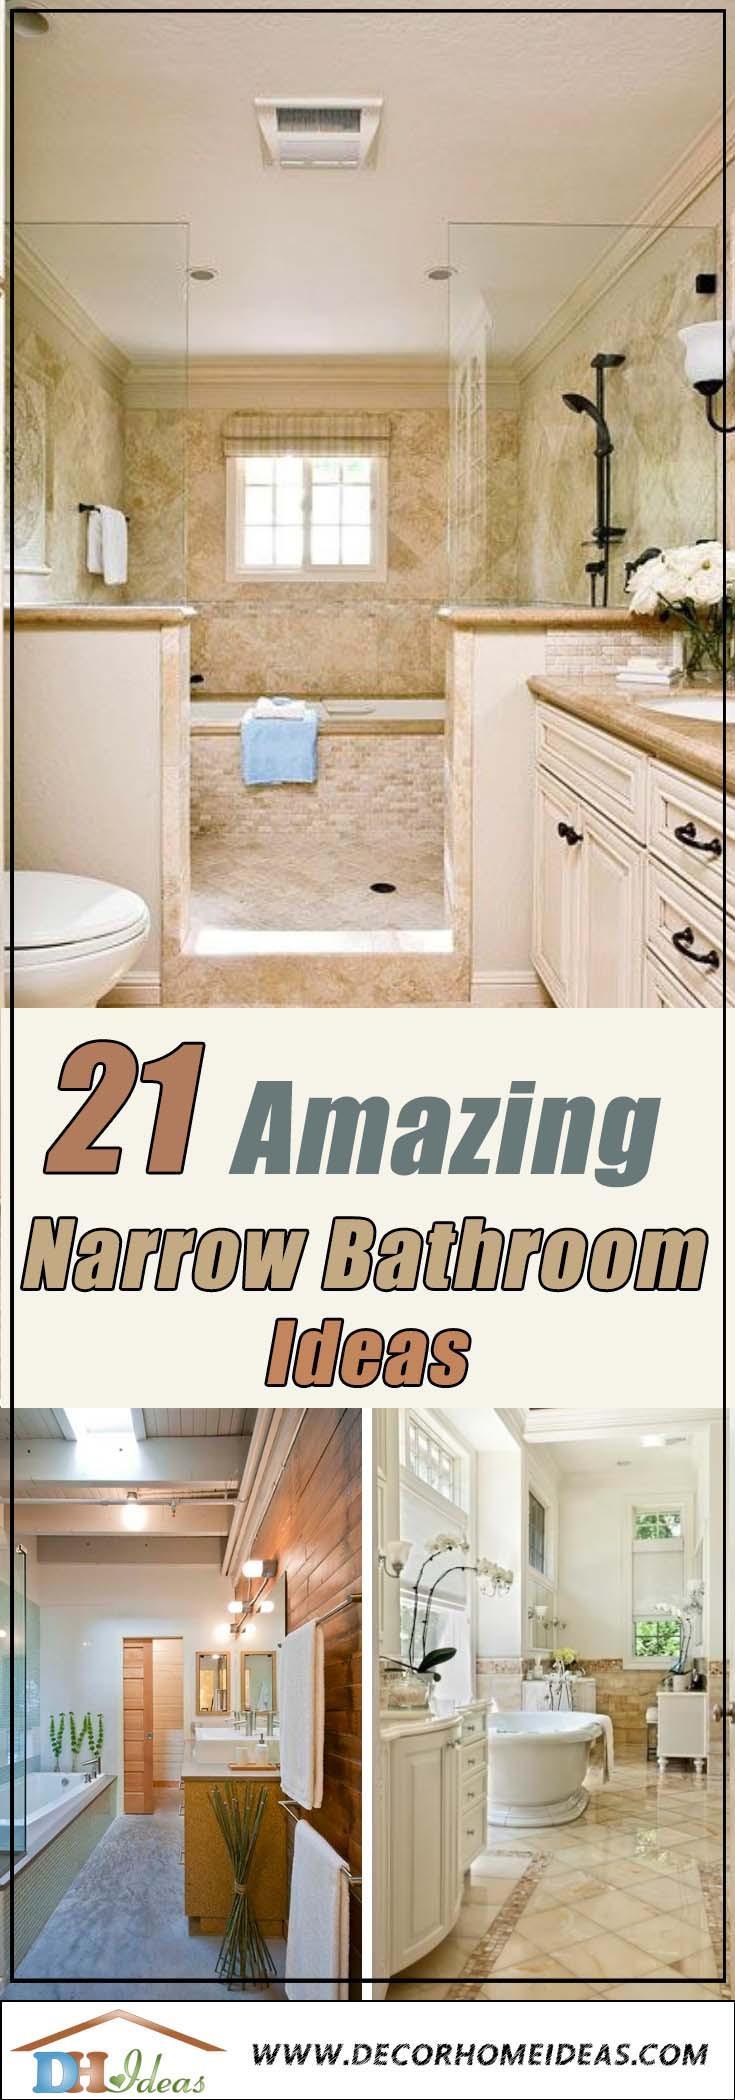 Small Narrow Bathroom Ideas  21 Amazing Narrow Bathroom Ideas